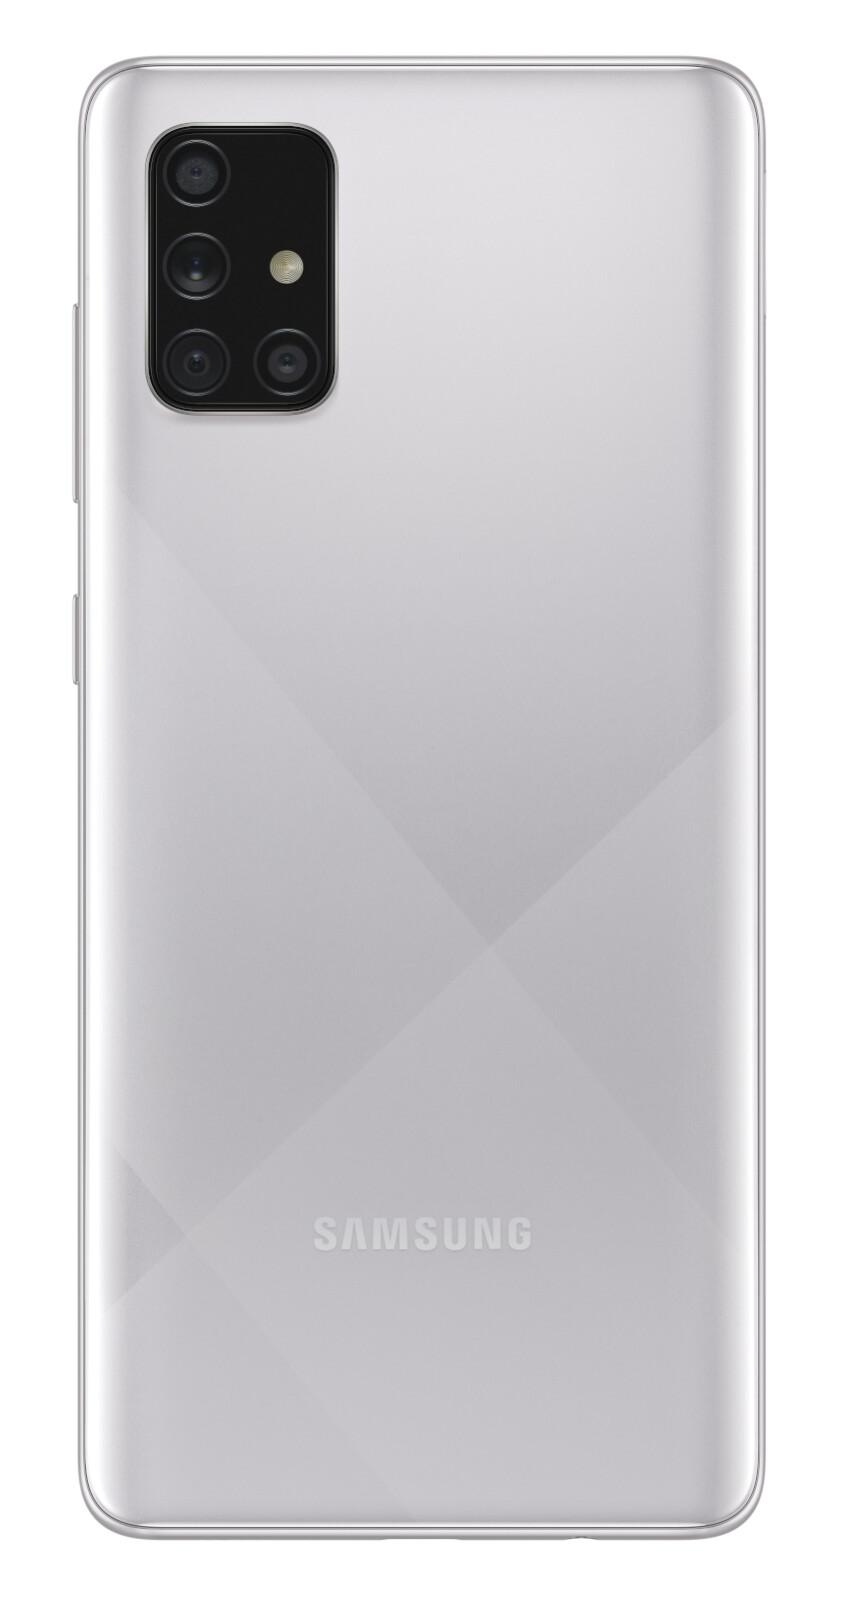 Samsung Galaxy A71 in Haze Crush Silver - Samsung Galaxy A51 and A71 now available in Haze Crush Silver color